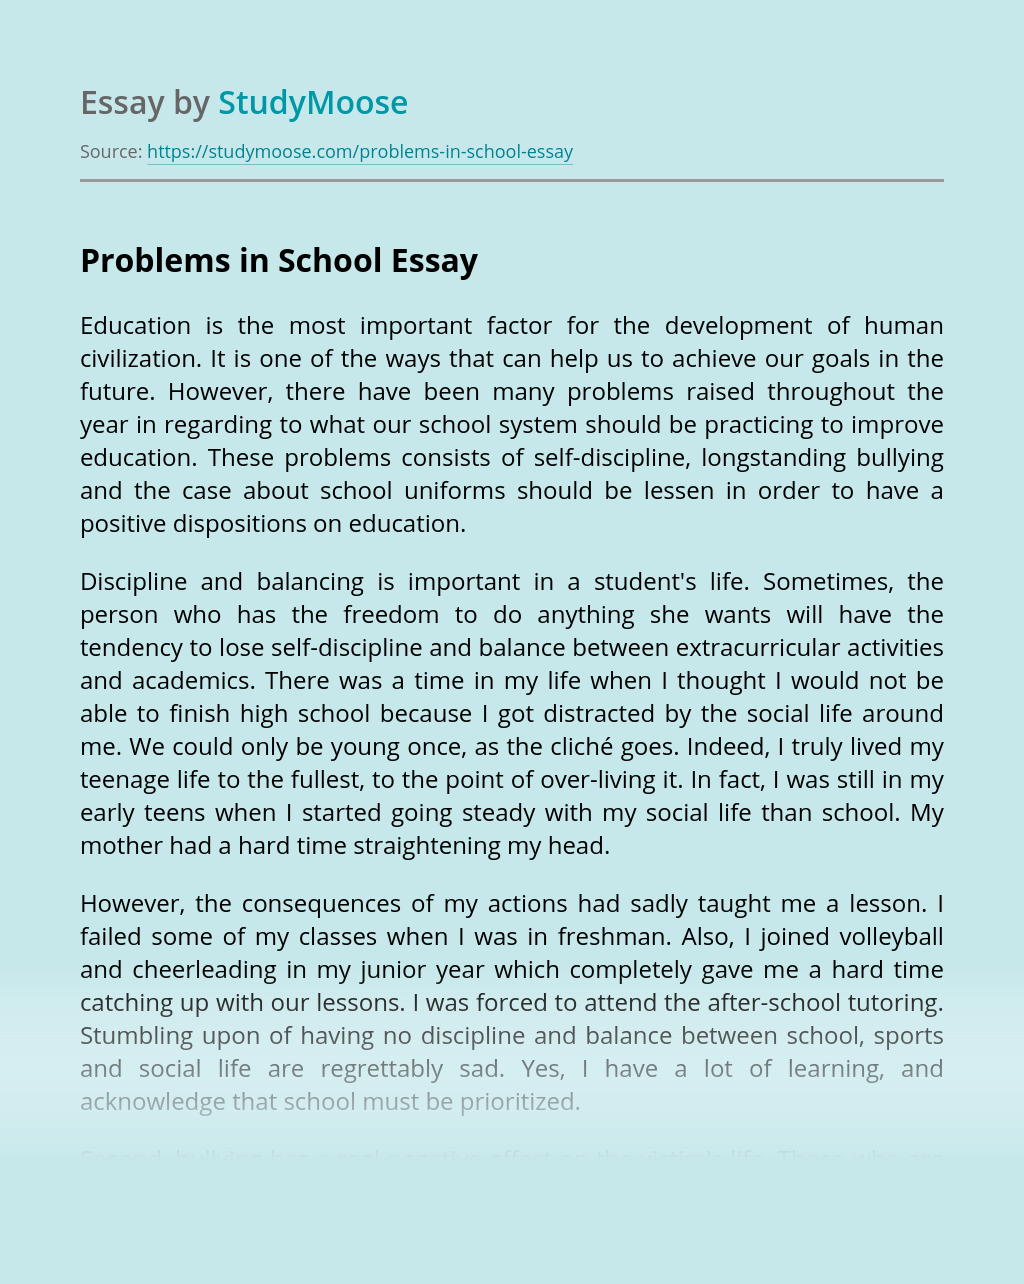 Problems in School